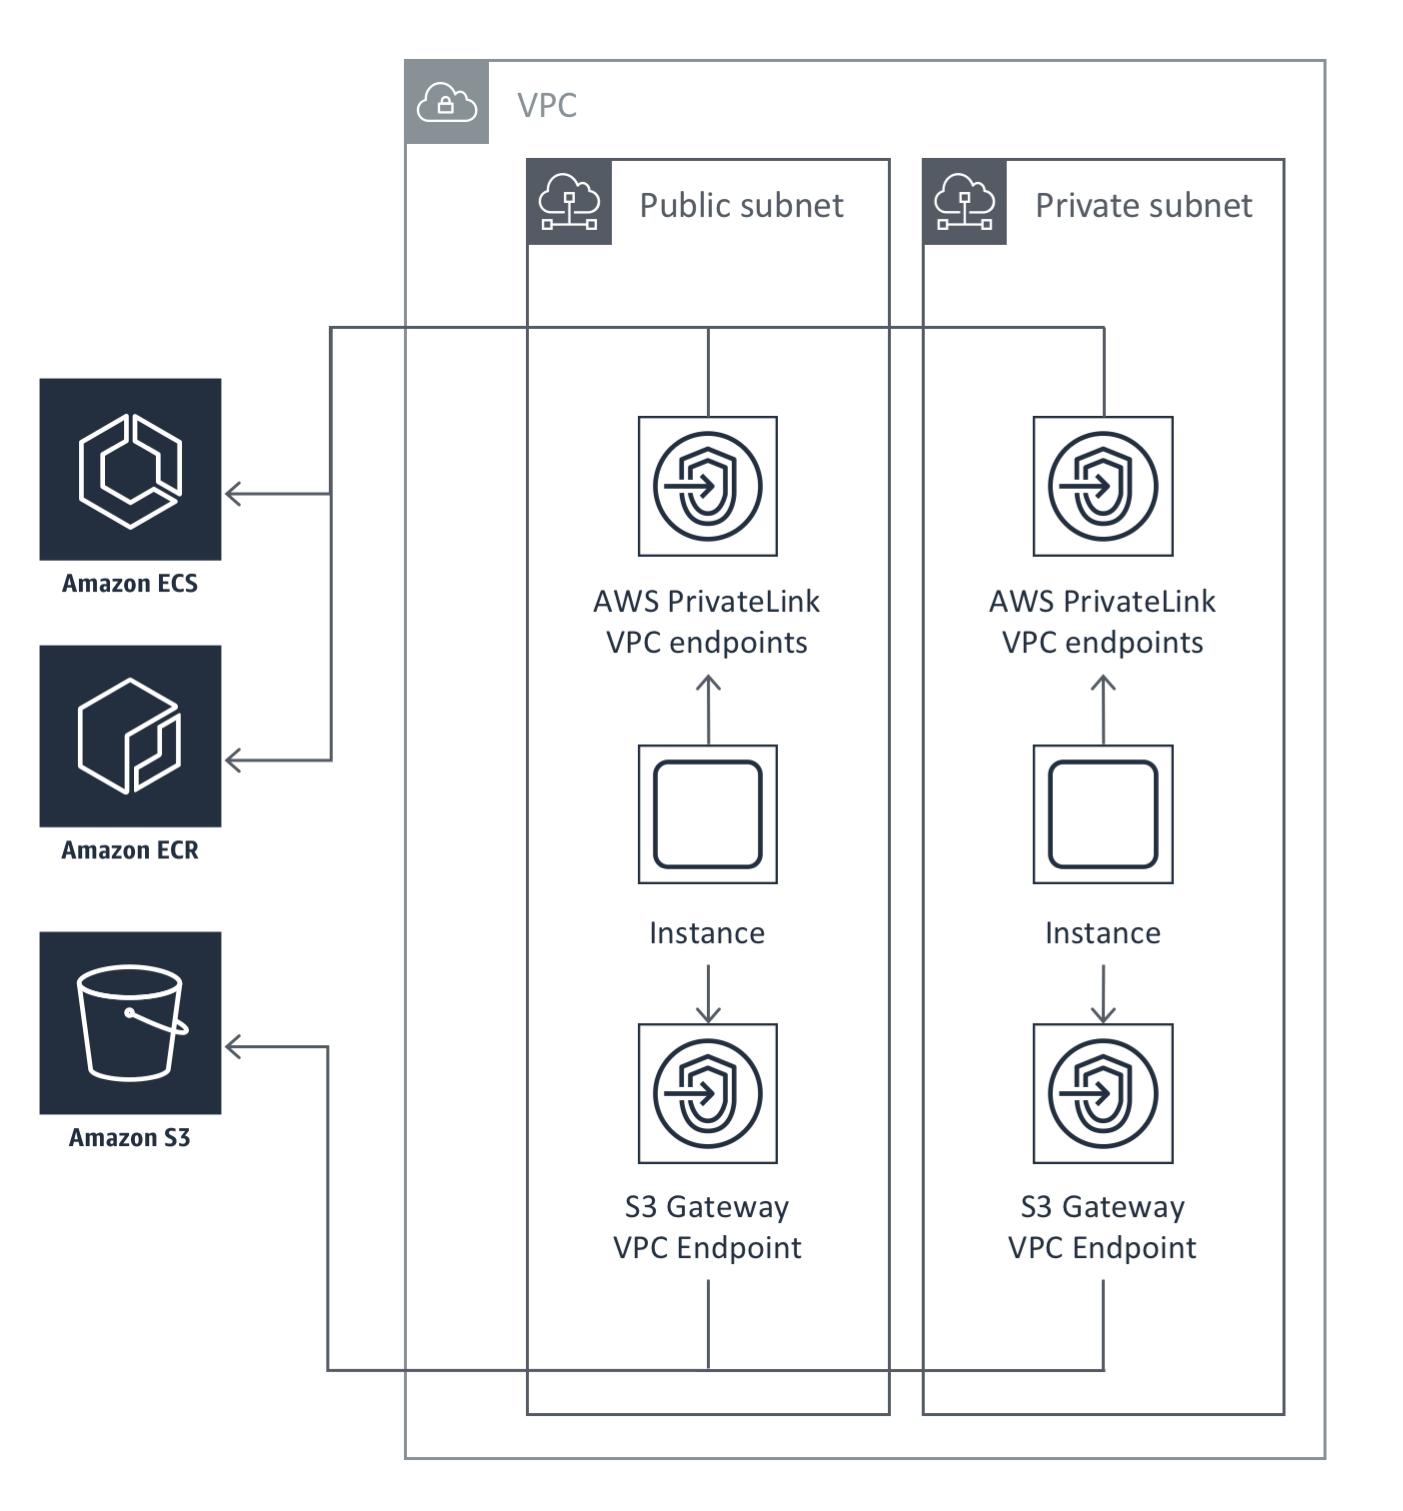 Setting up AWS PrivateLink for Amazon ECS, and Amazon ECR